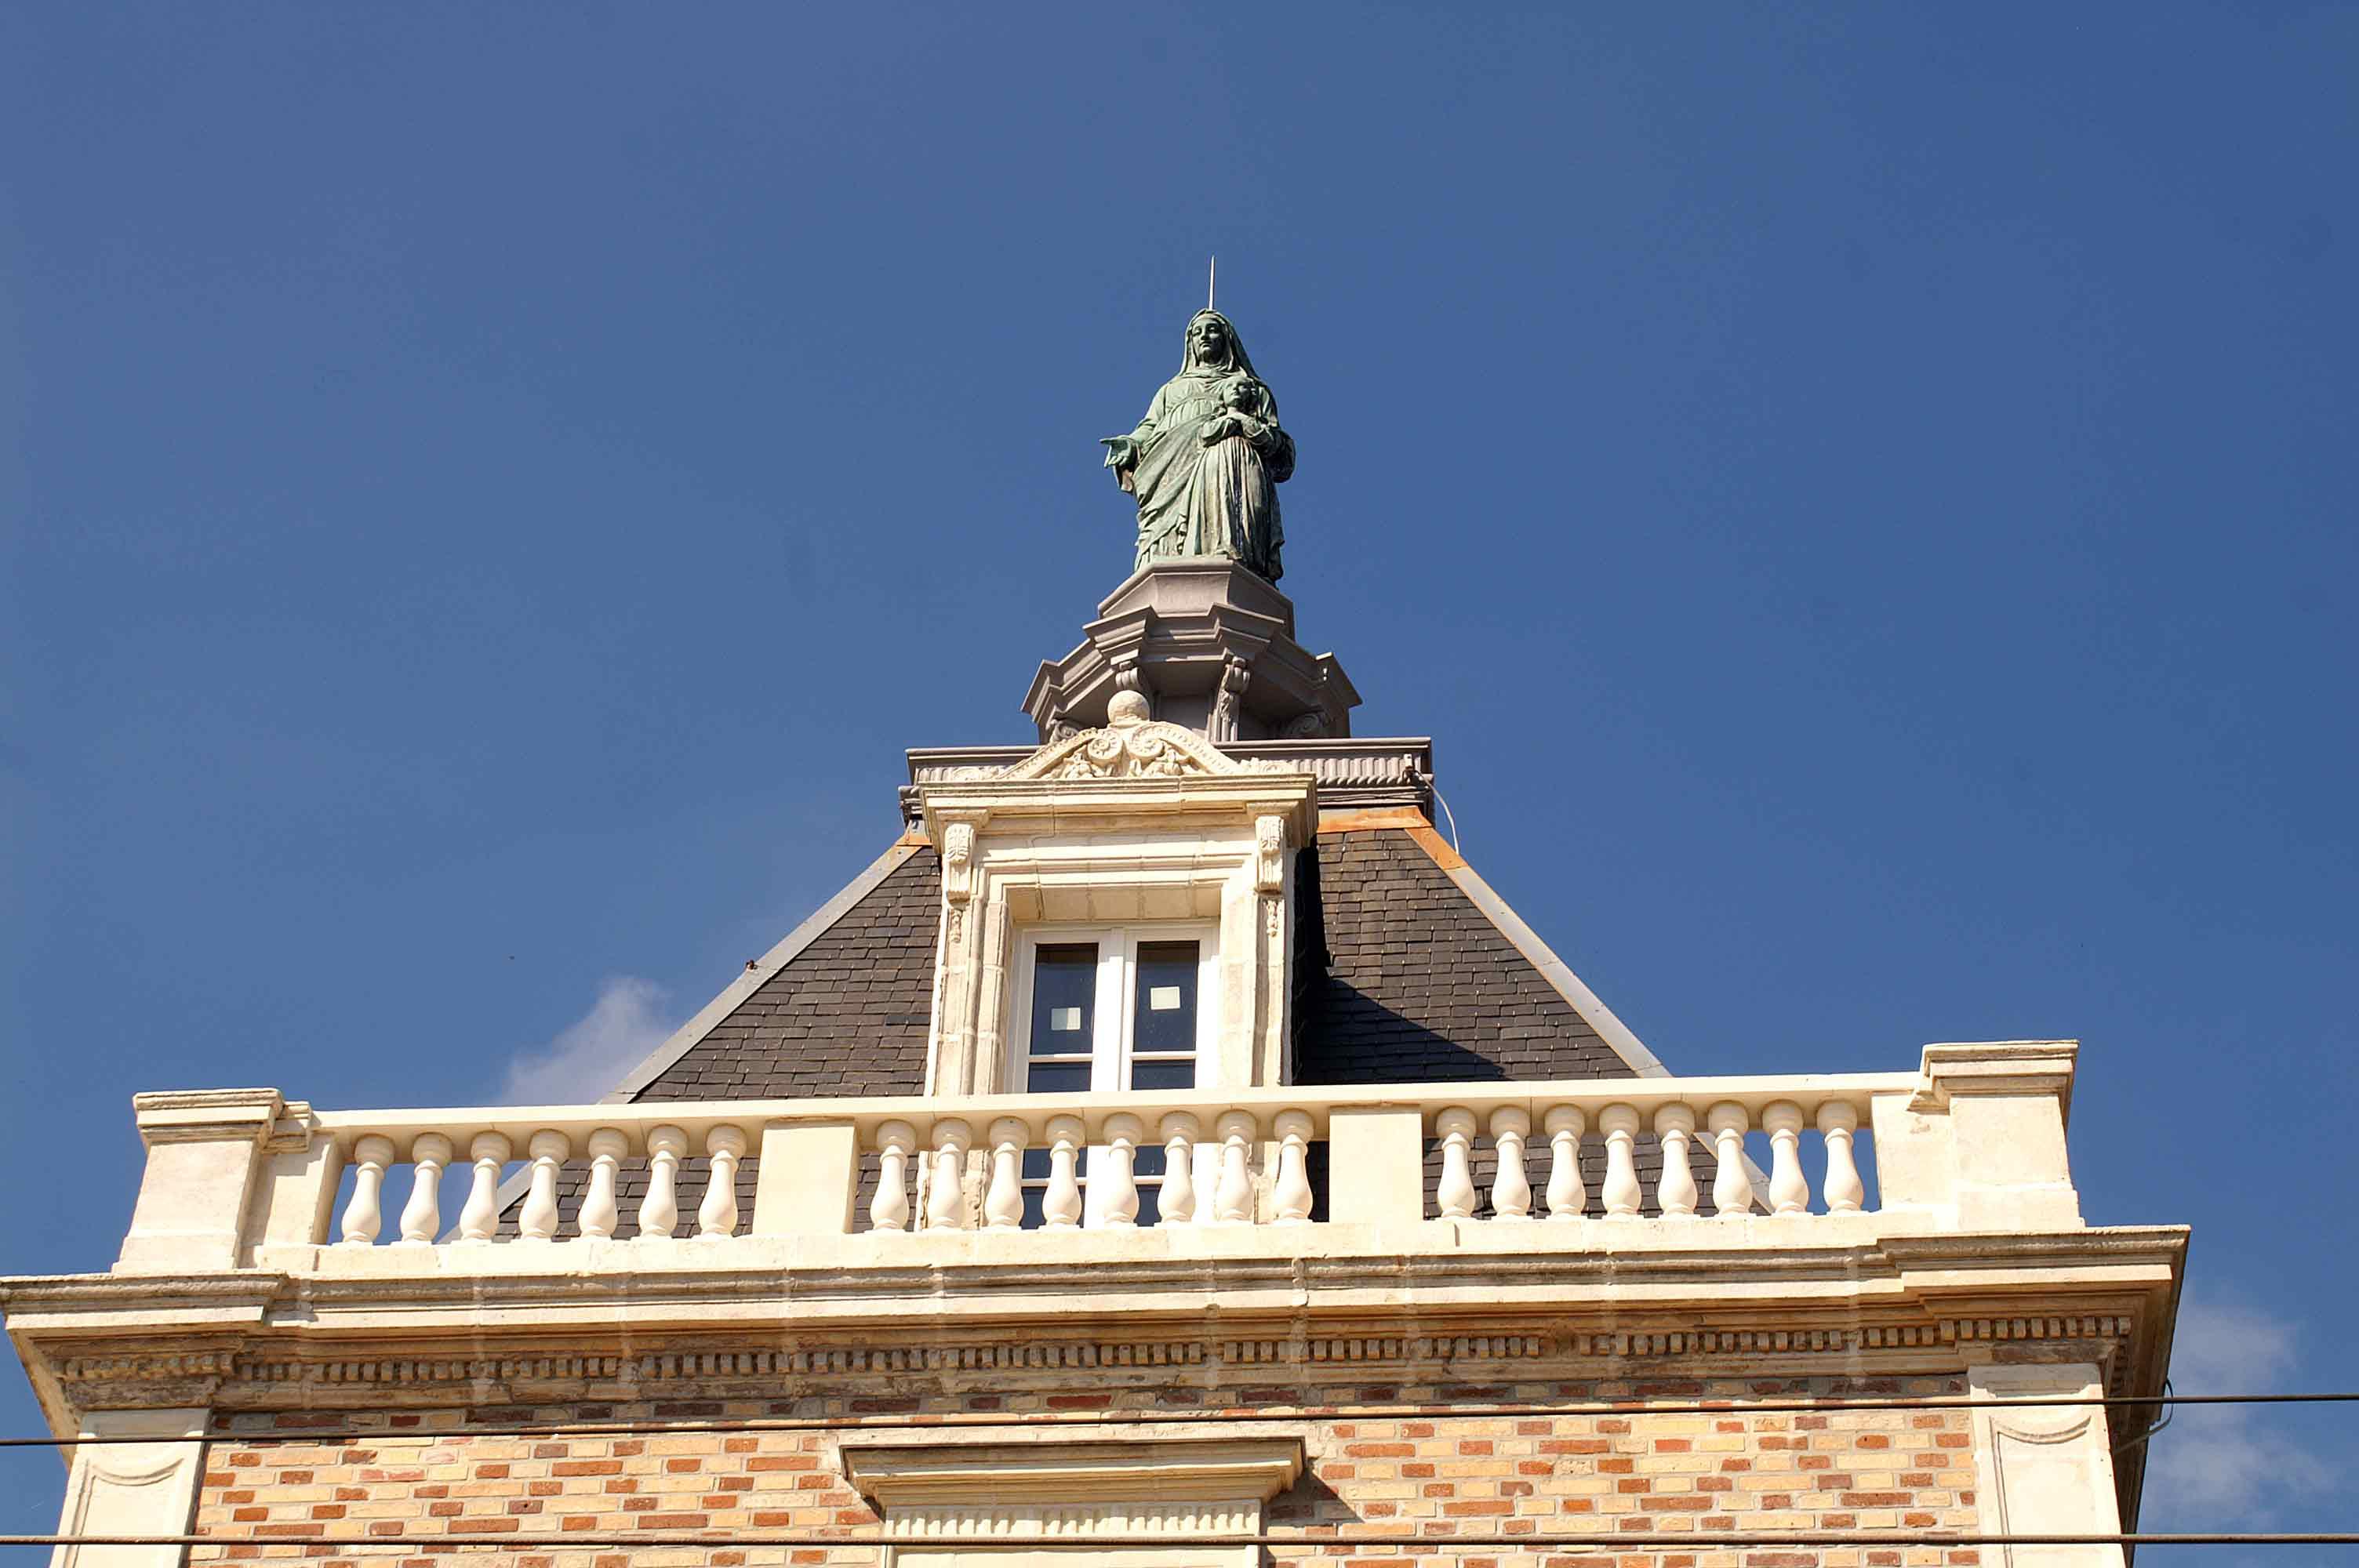 http://upload.wikimedia.org/wikipedia/commons/1/17/Gare-Statue-Sainte-Anne.jpg